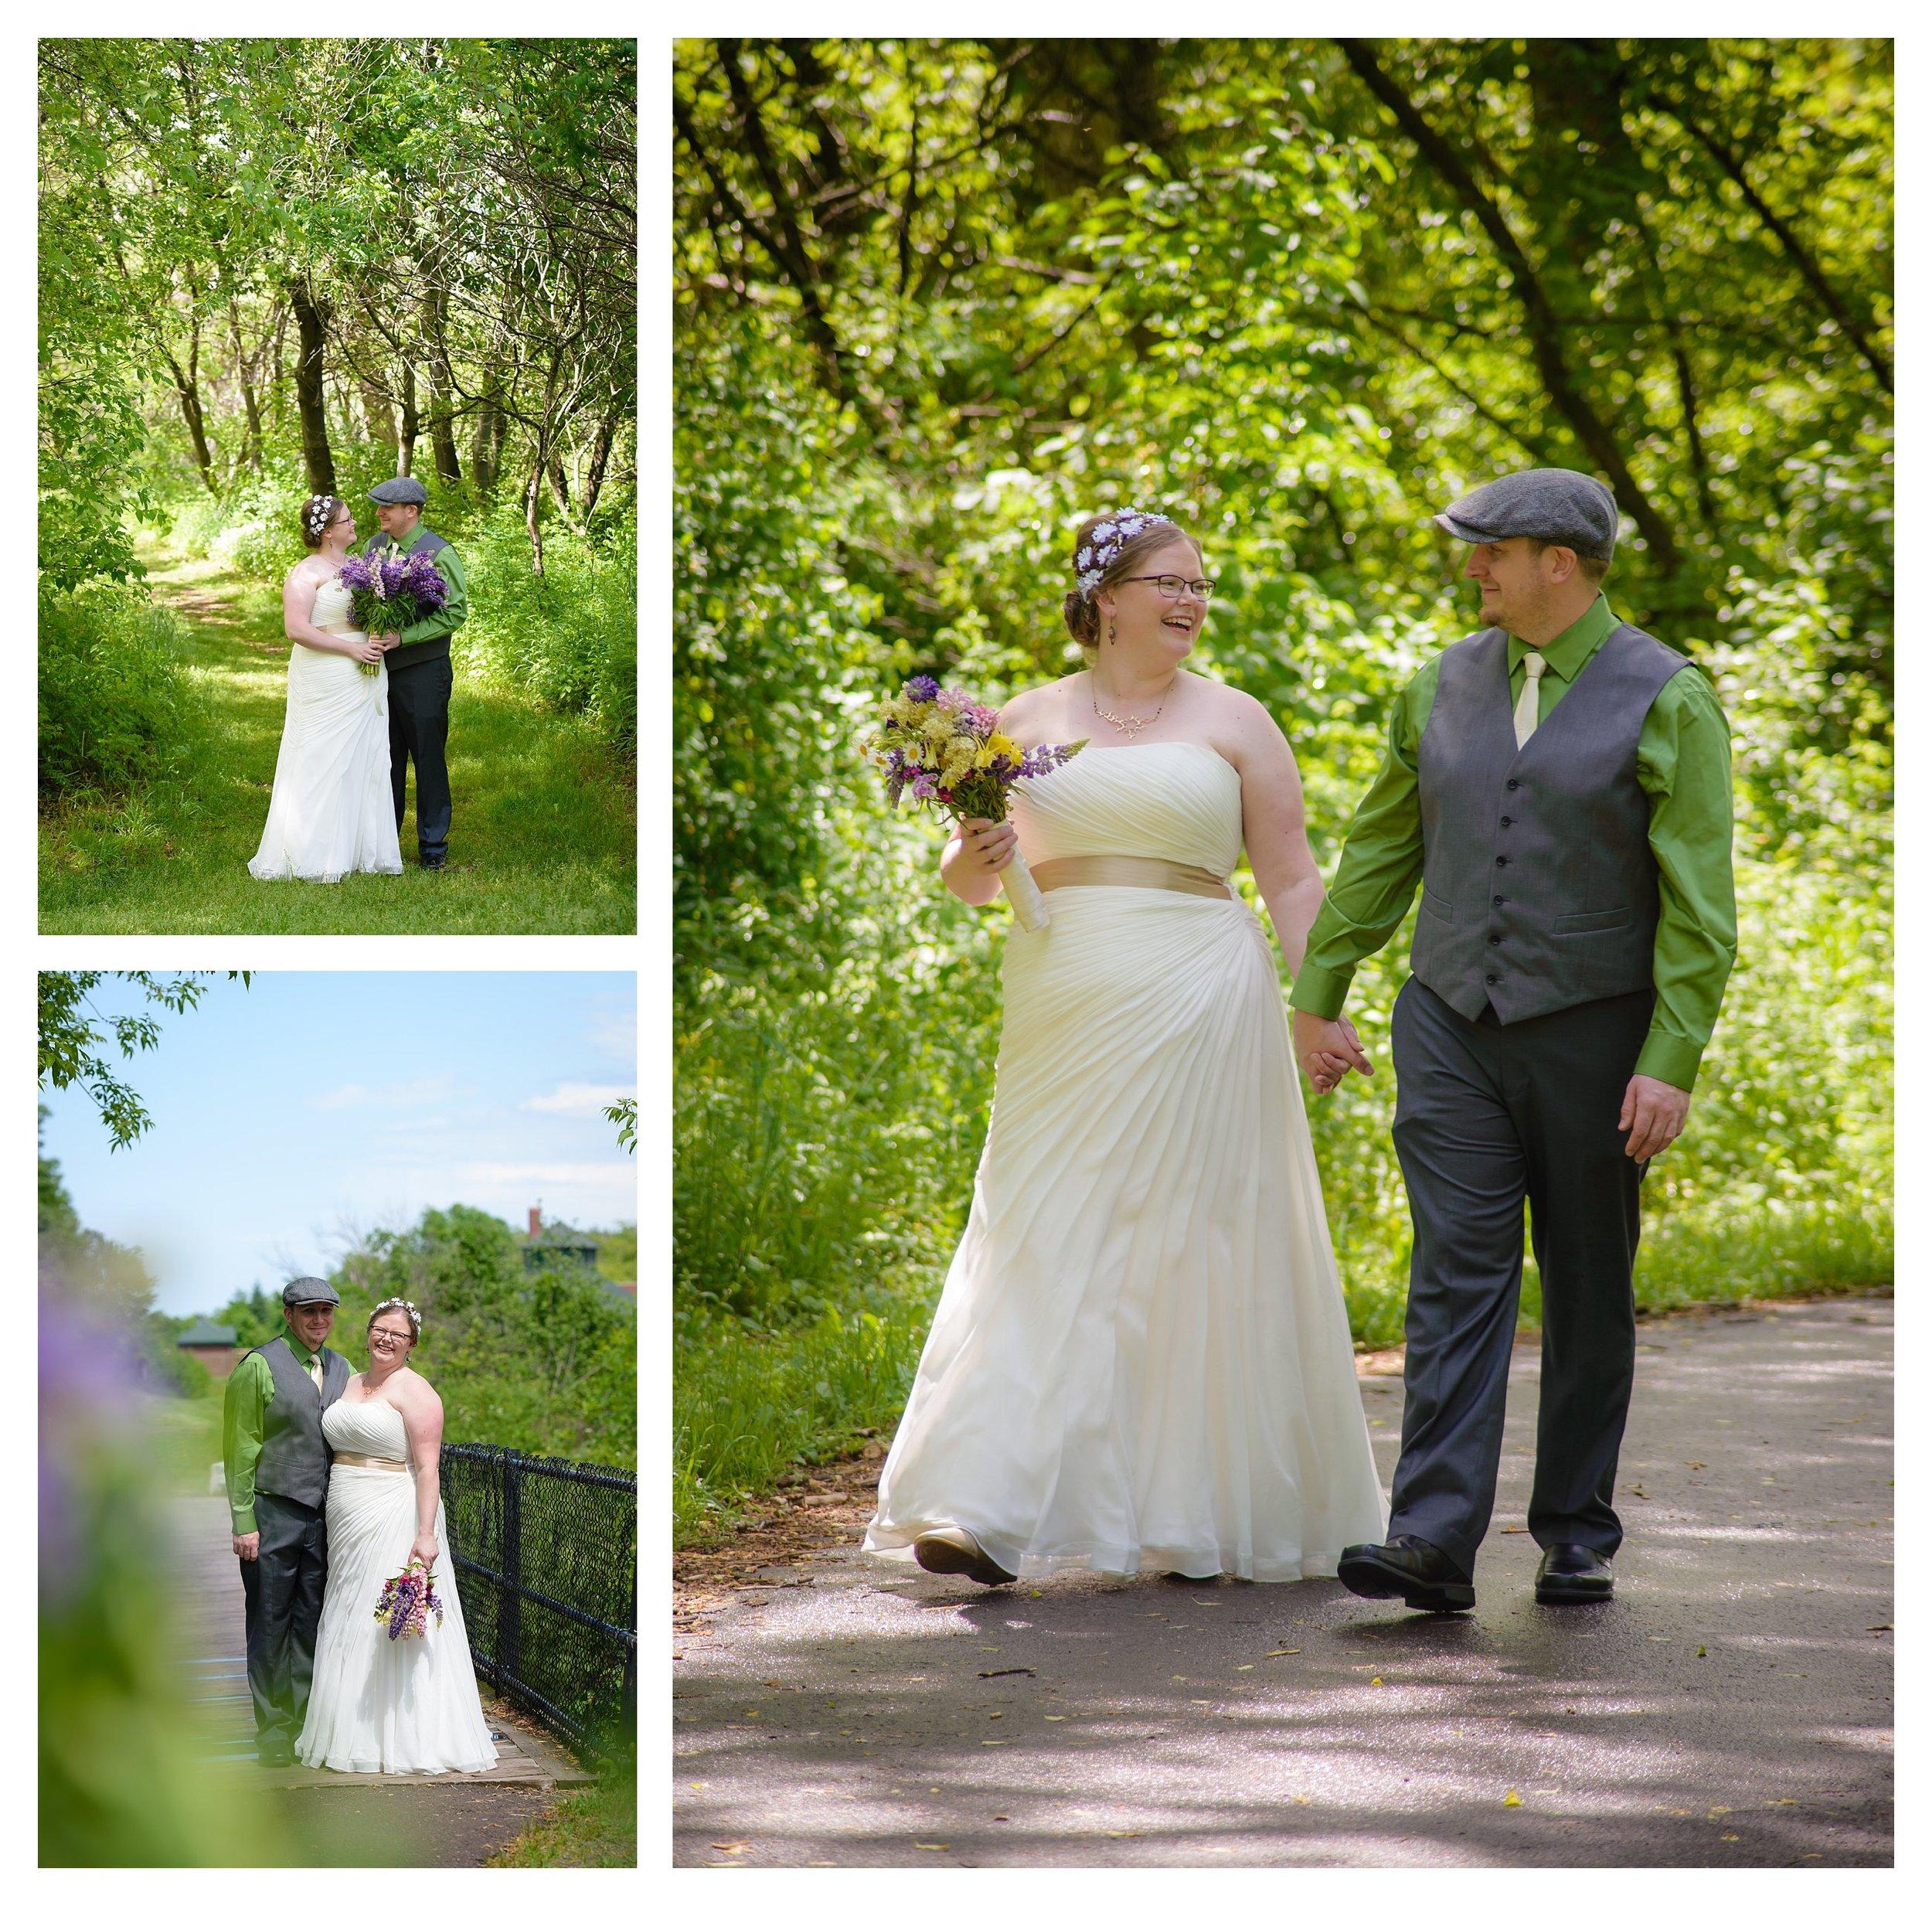 ashland oredock northwoods wisconsin wedding ps 139 photography_0276.jpg